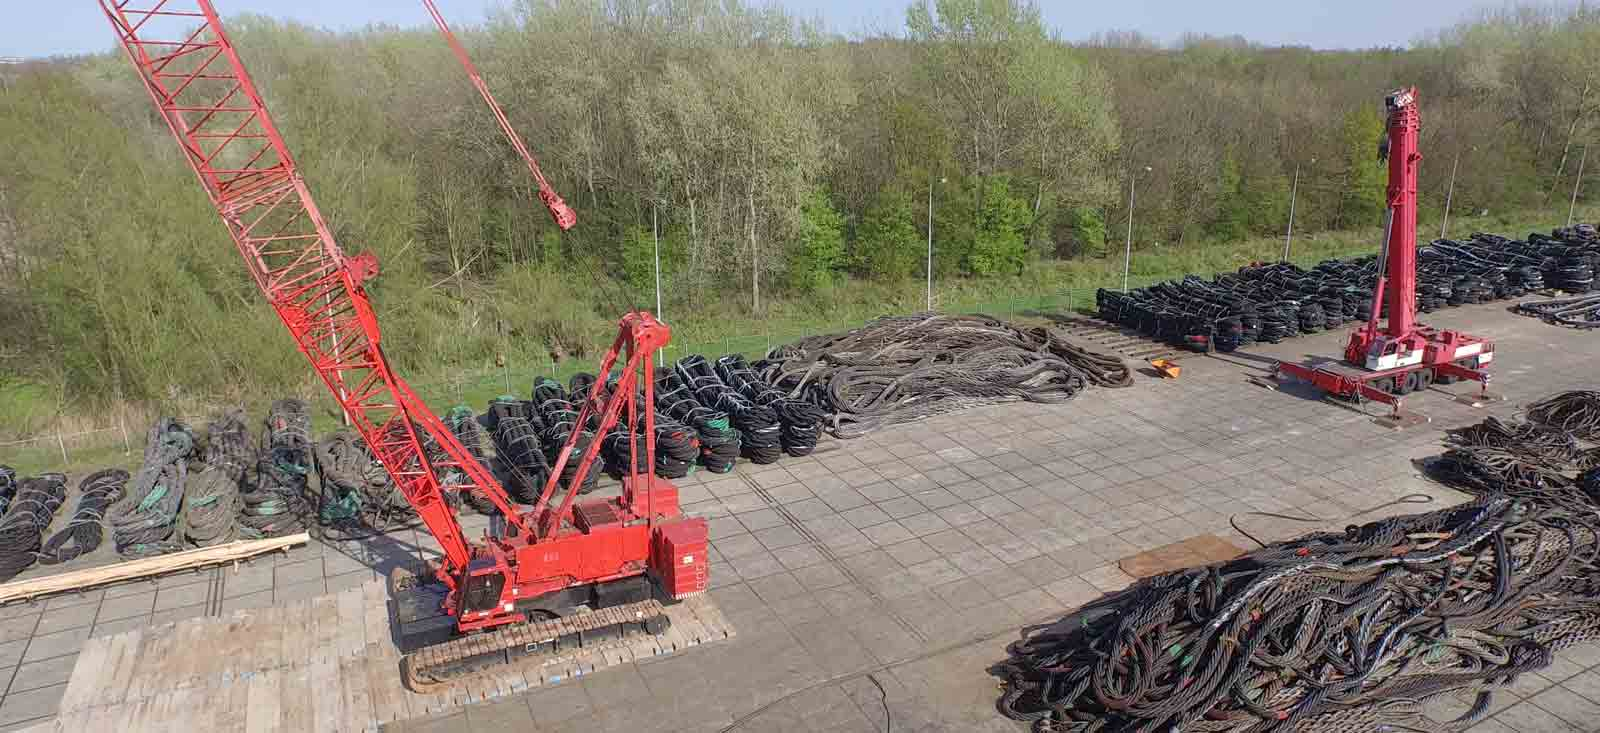 Lifting equipment storage and handling